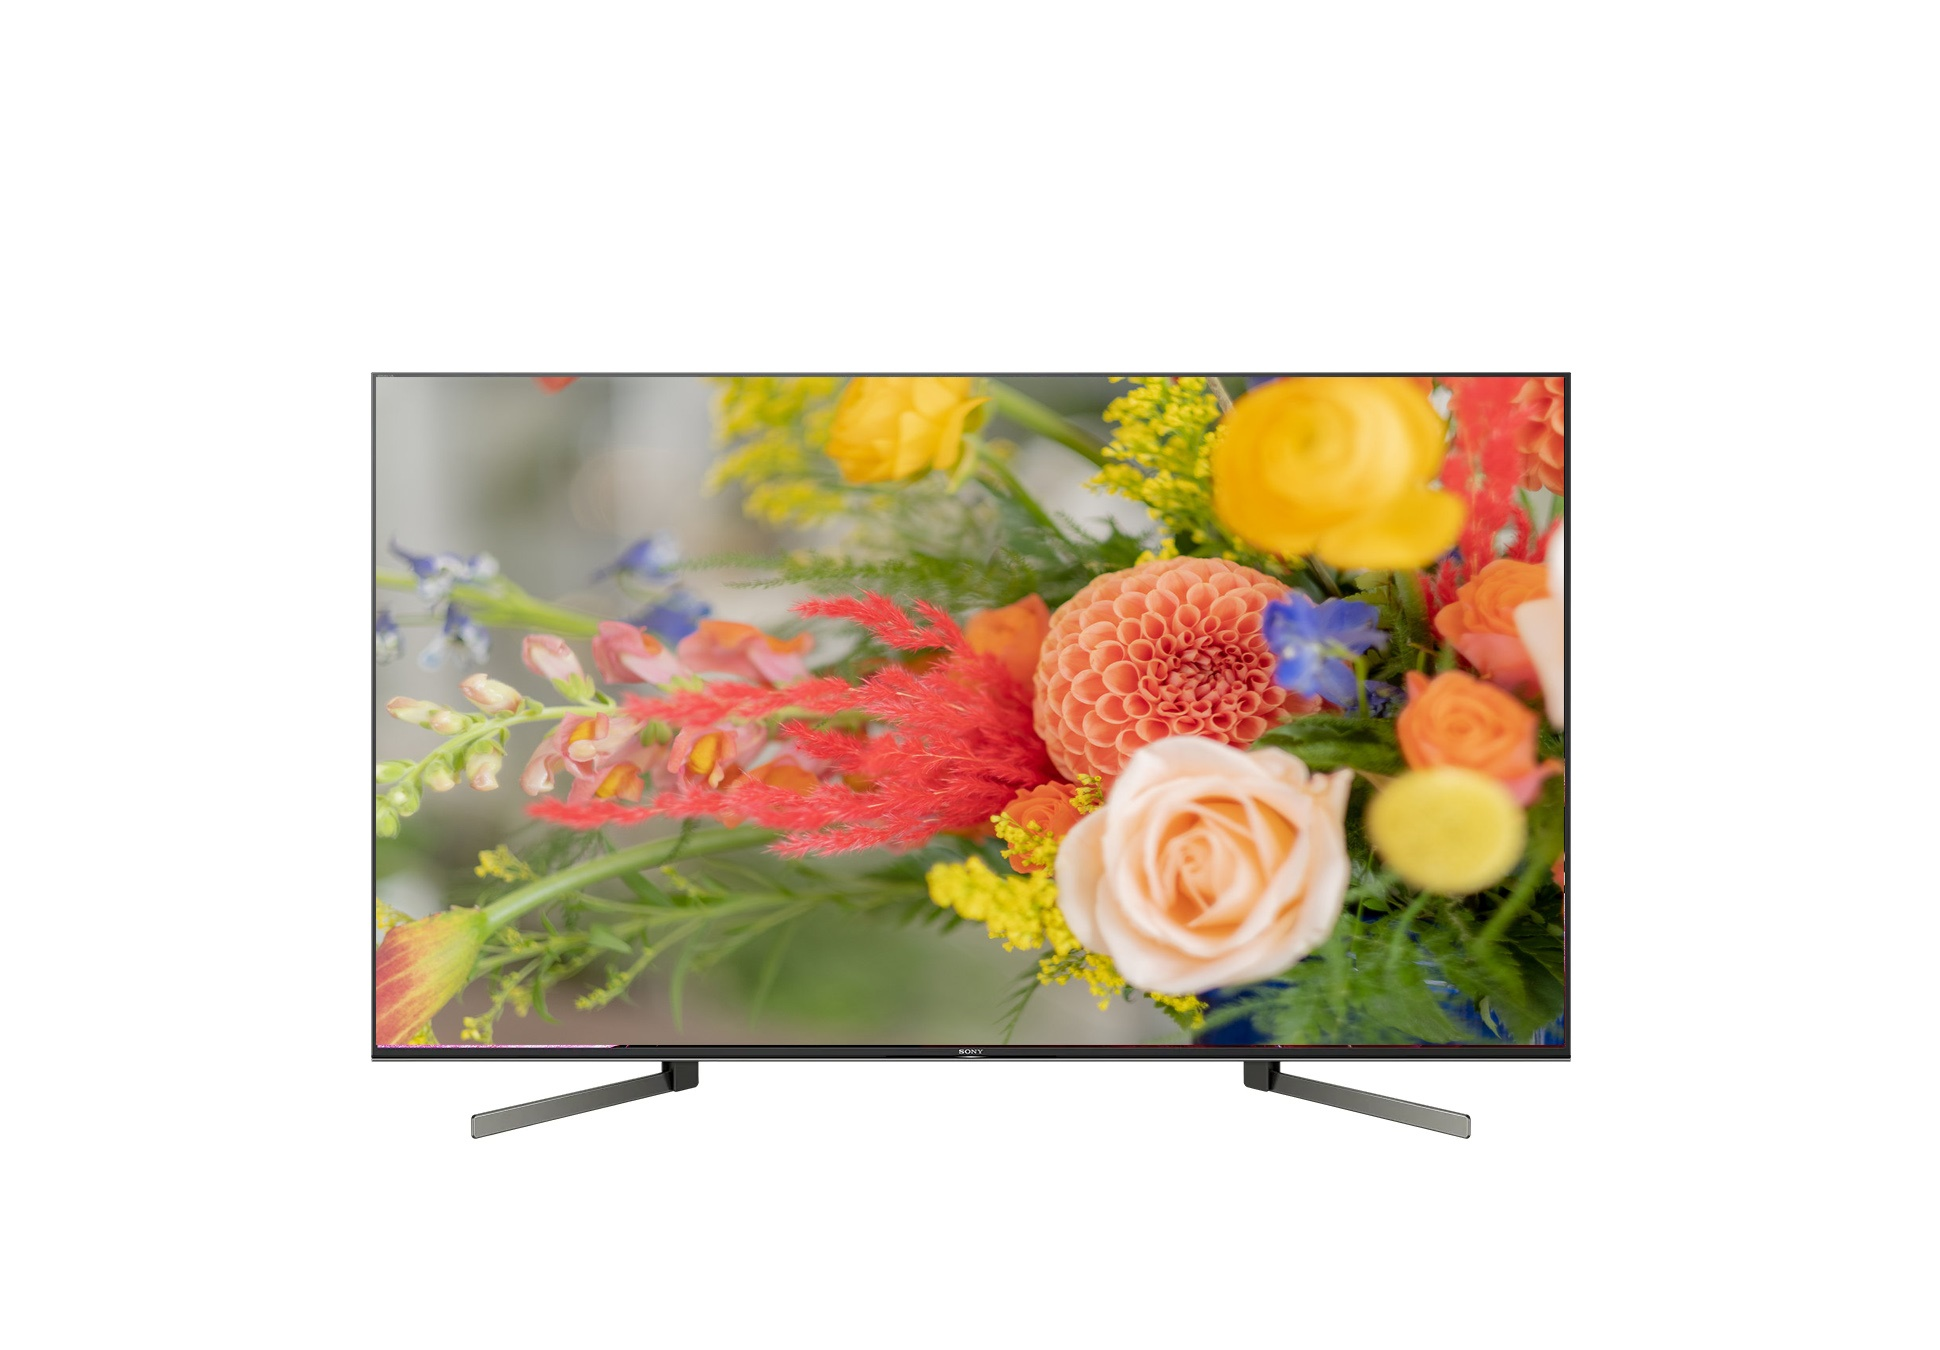 تلویزیون 75 اینچ 4K سونی مدل 75x9500g